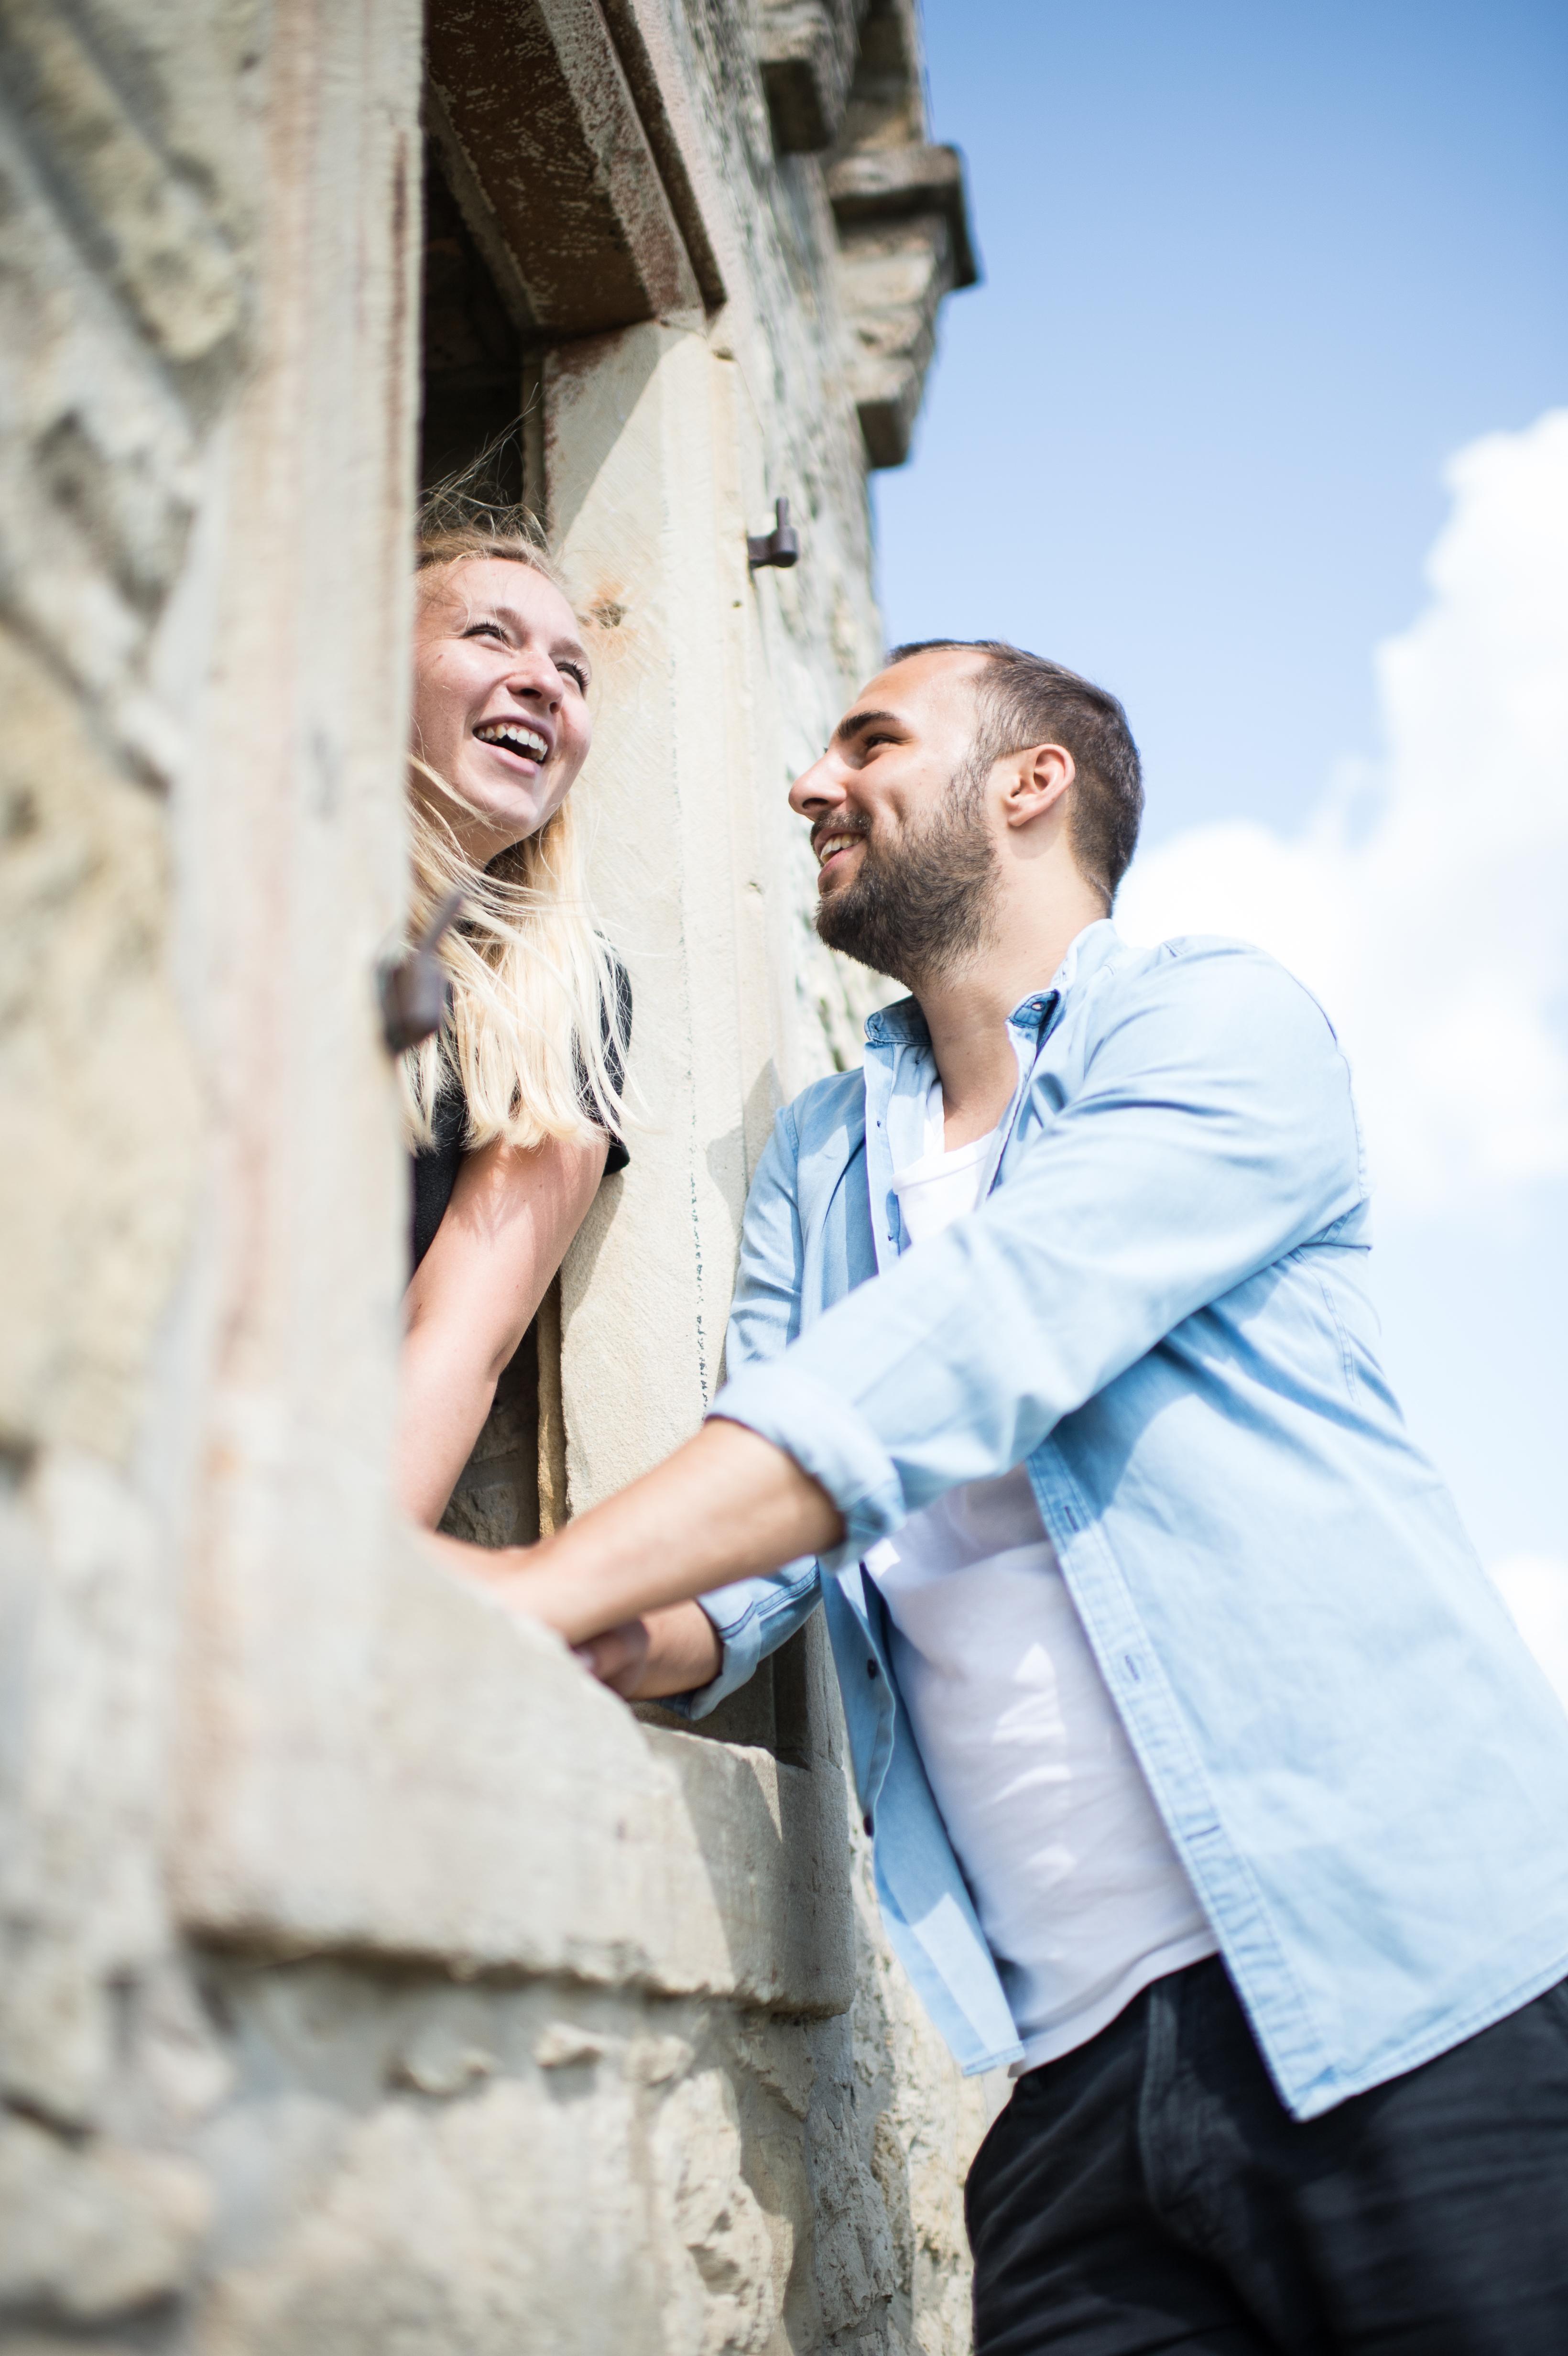 Romantik im alten Turm